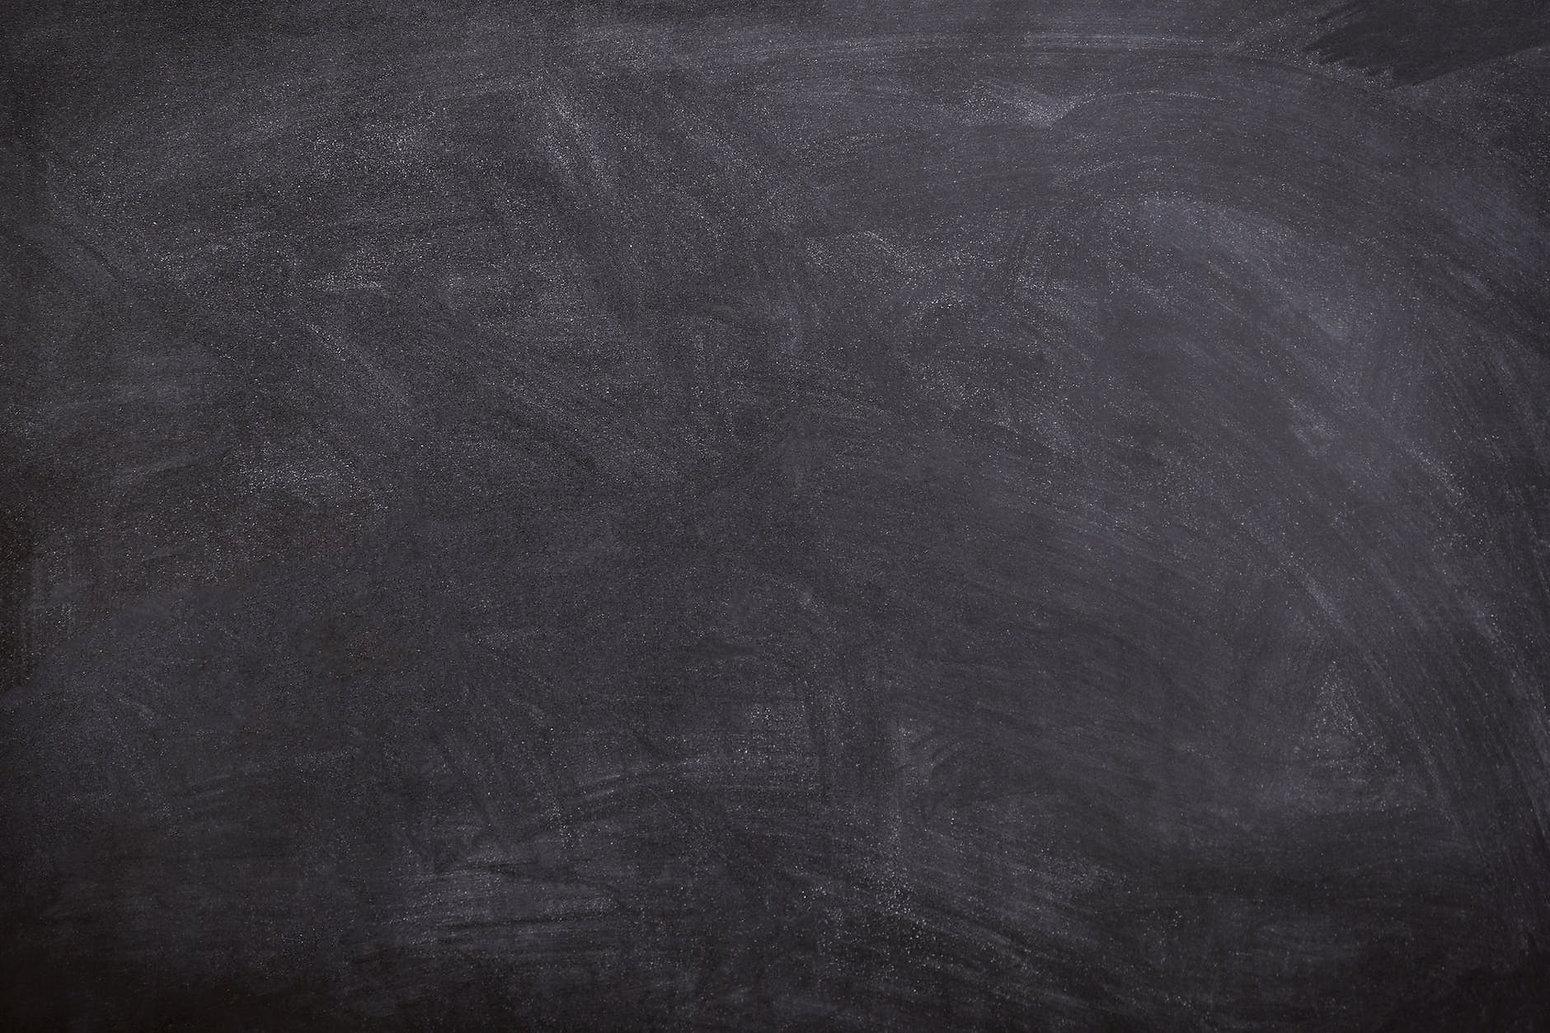 blackboard 1.jpeg